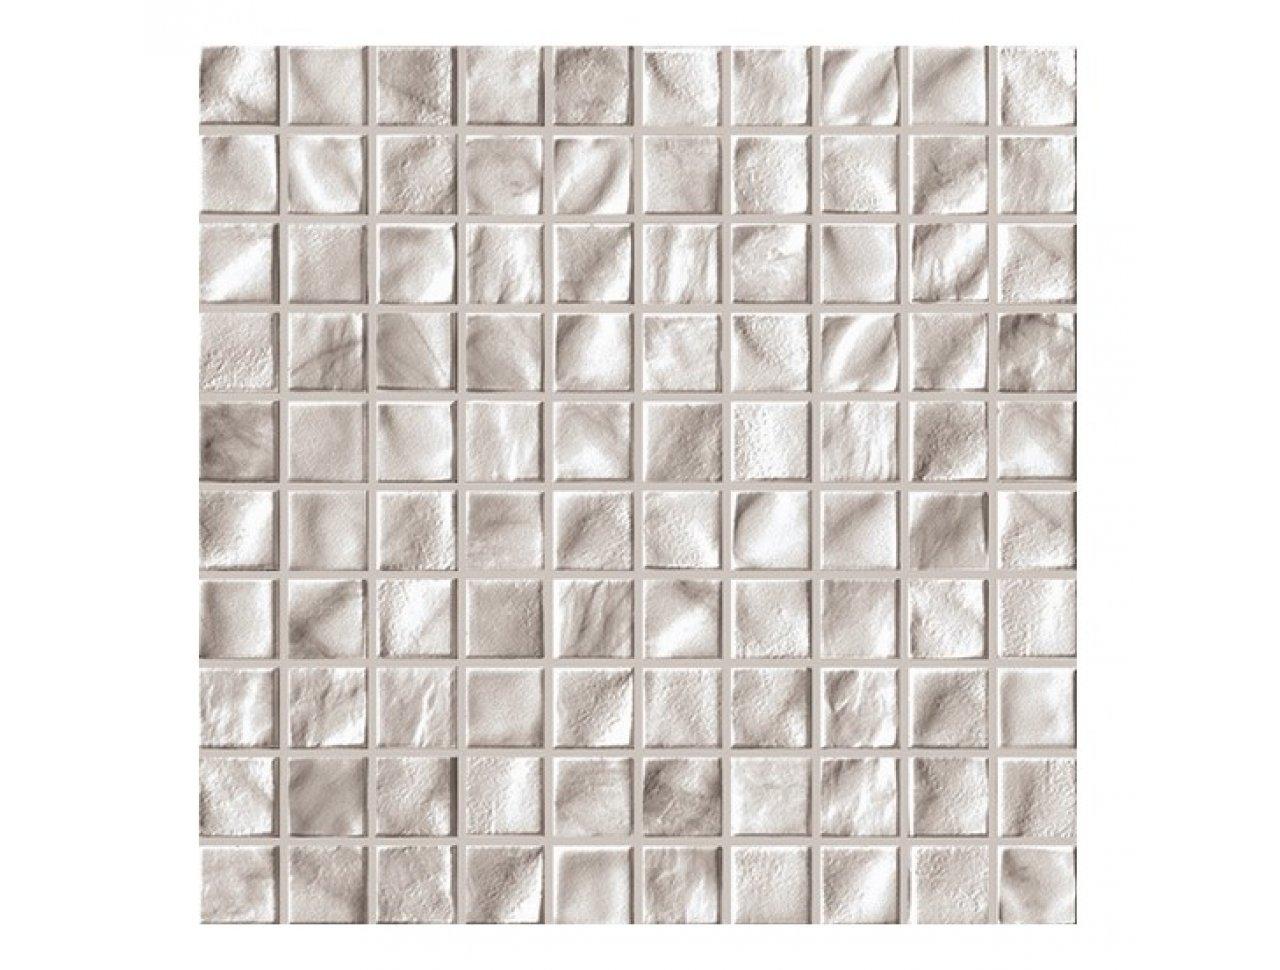 Мозаика FAP Roma Natura Statuario Mosaico 30.5 x 30.5 см, Арт. fLTL